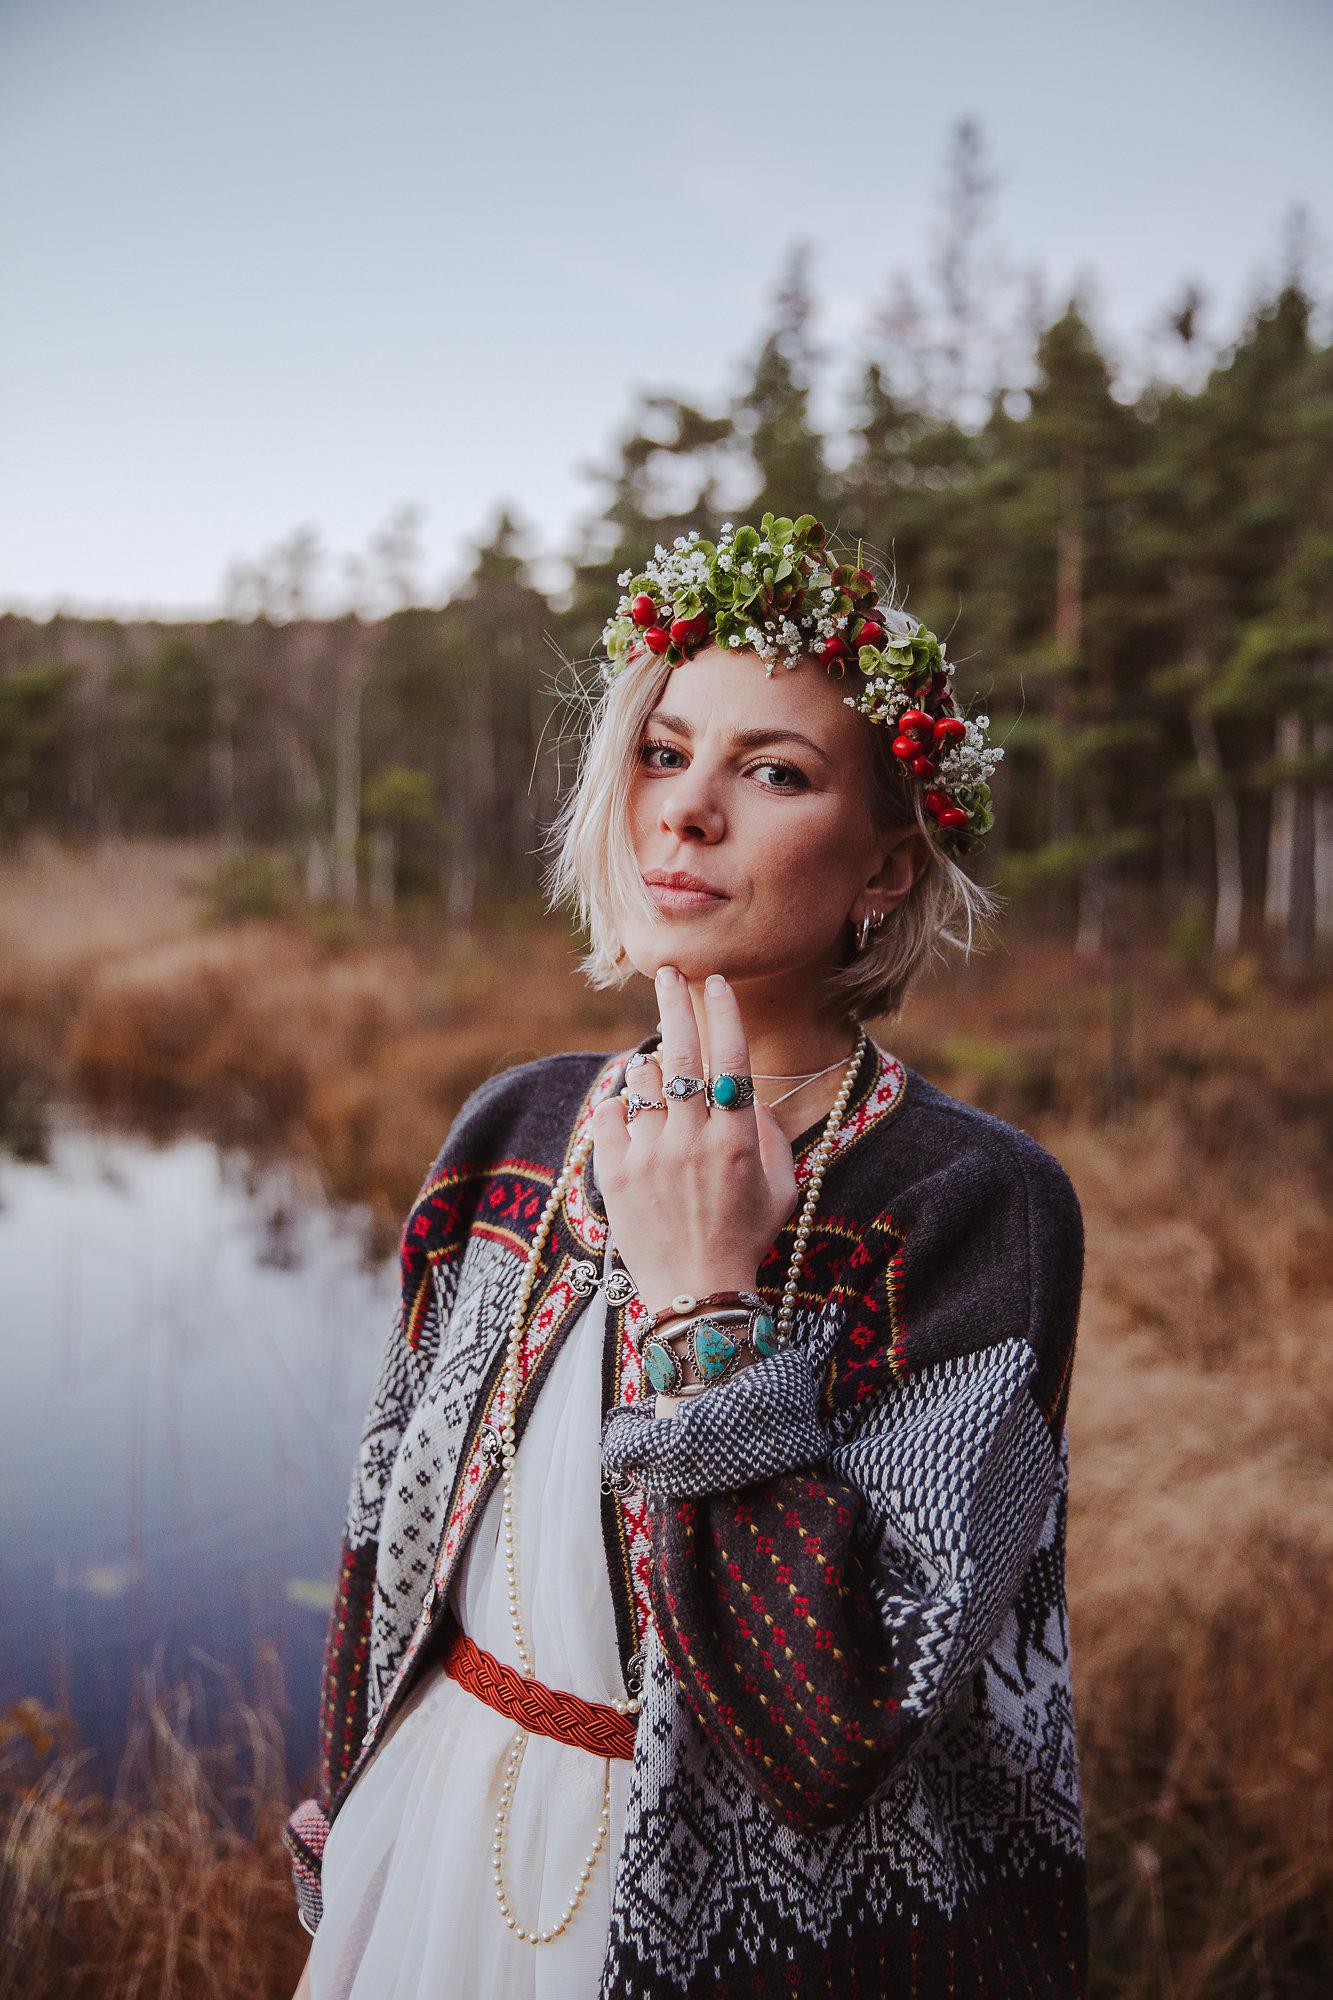 MajAxel_2017_Sweden_Weddingphotographer_NatalieGreppi_WEB-151.jpg